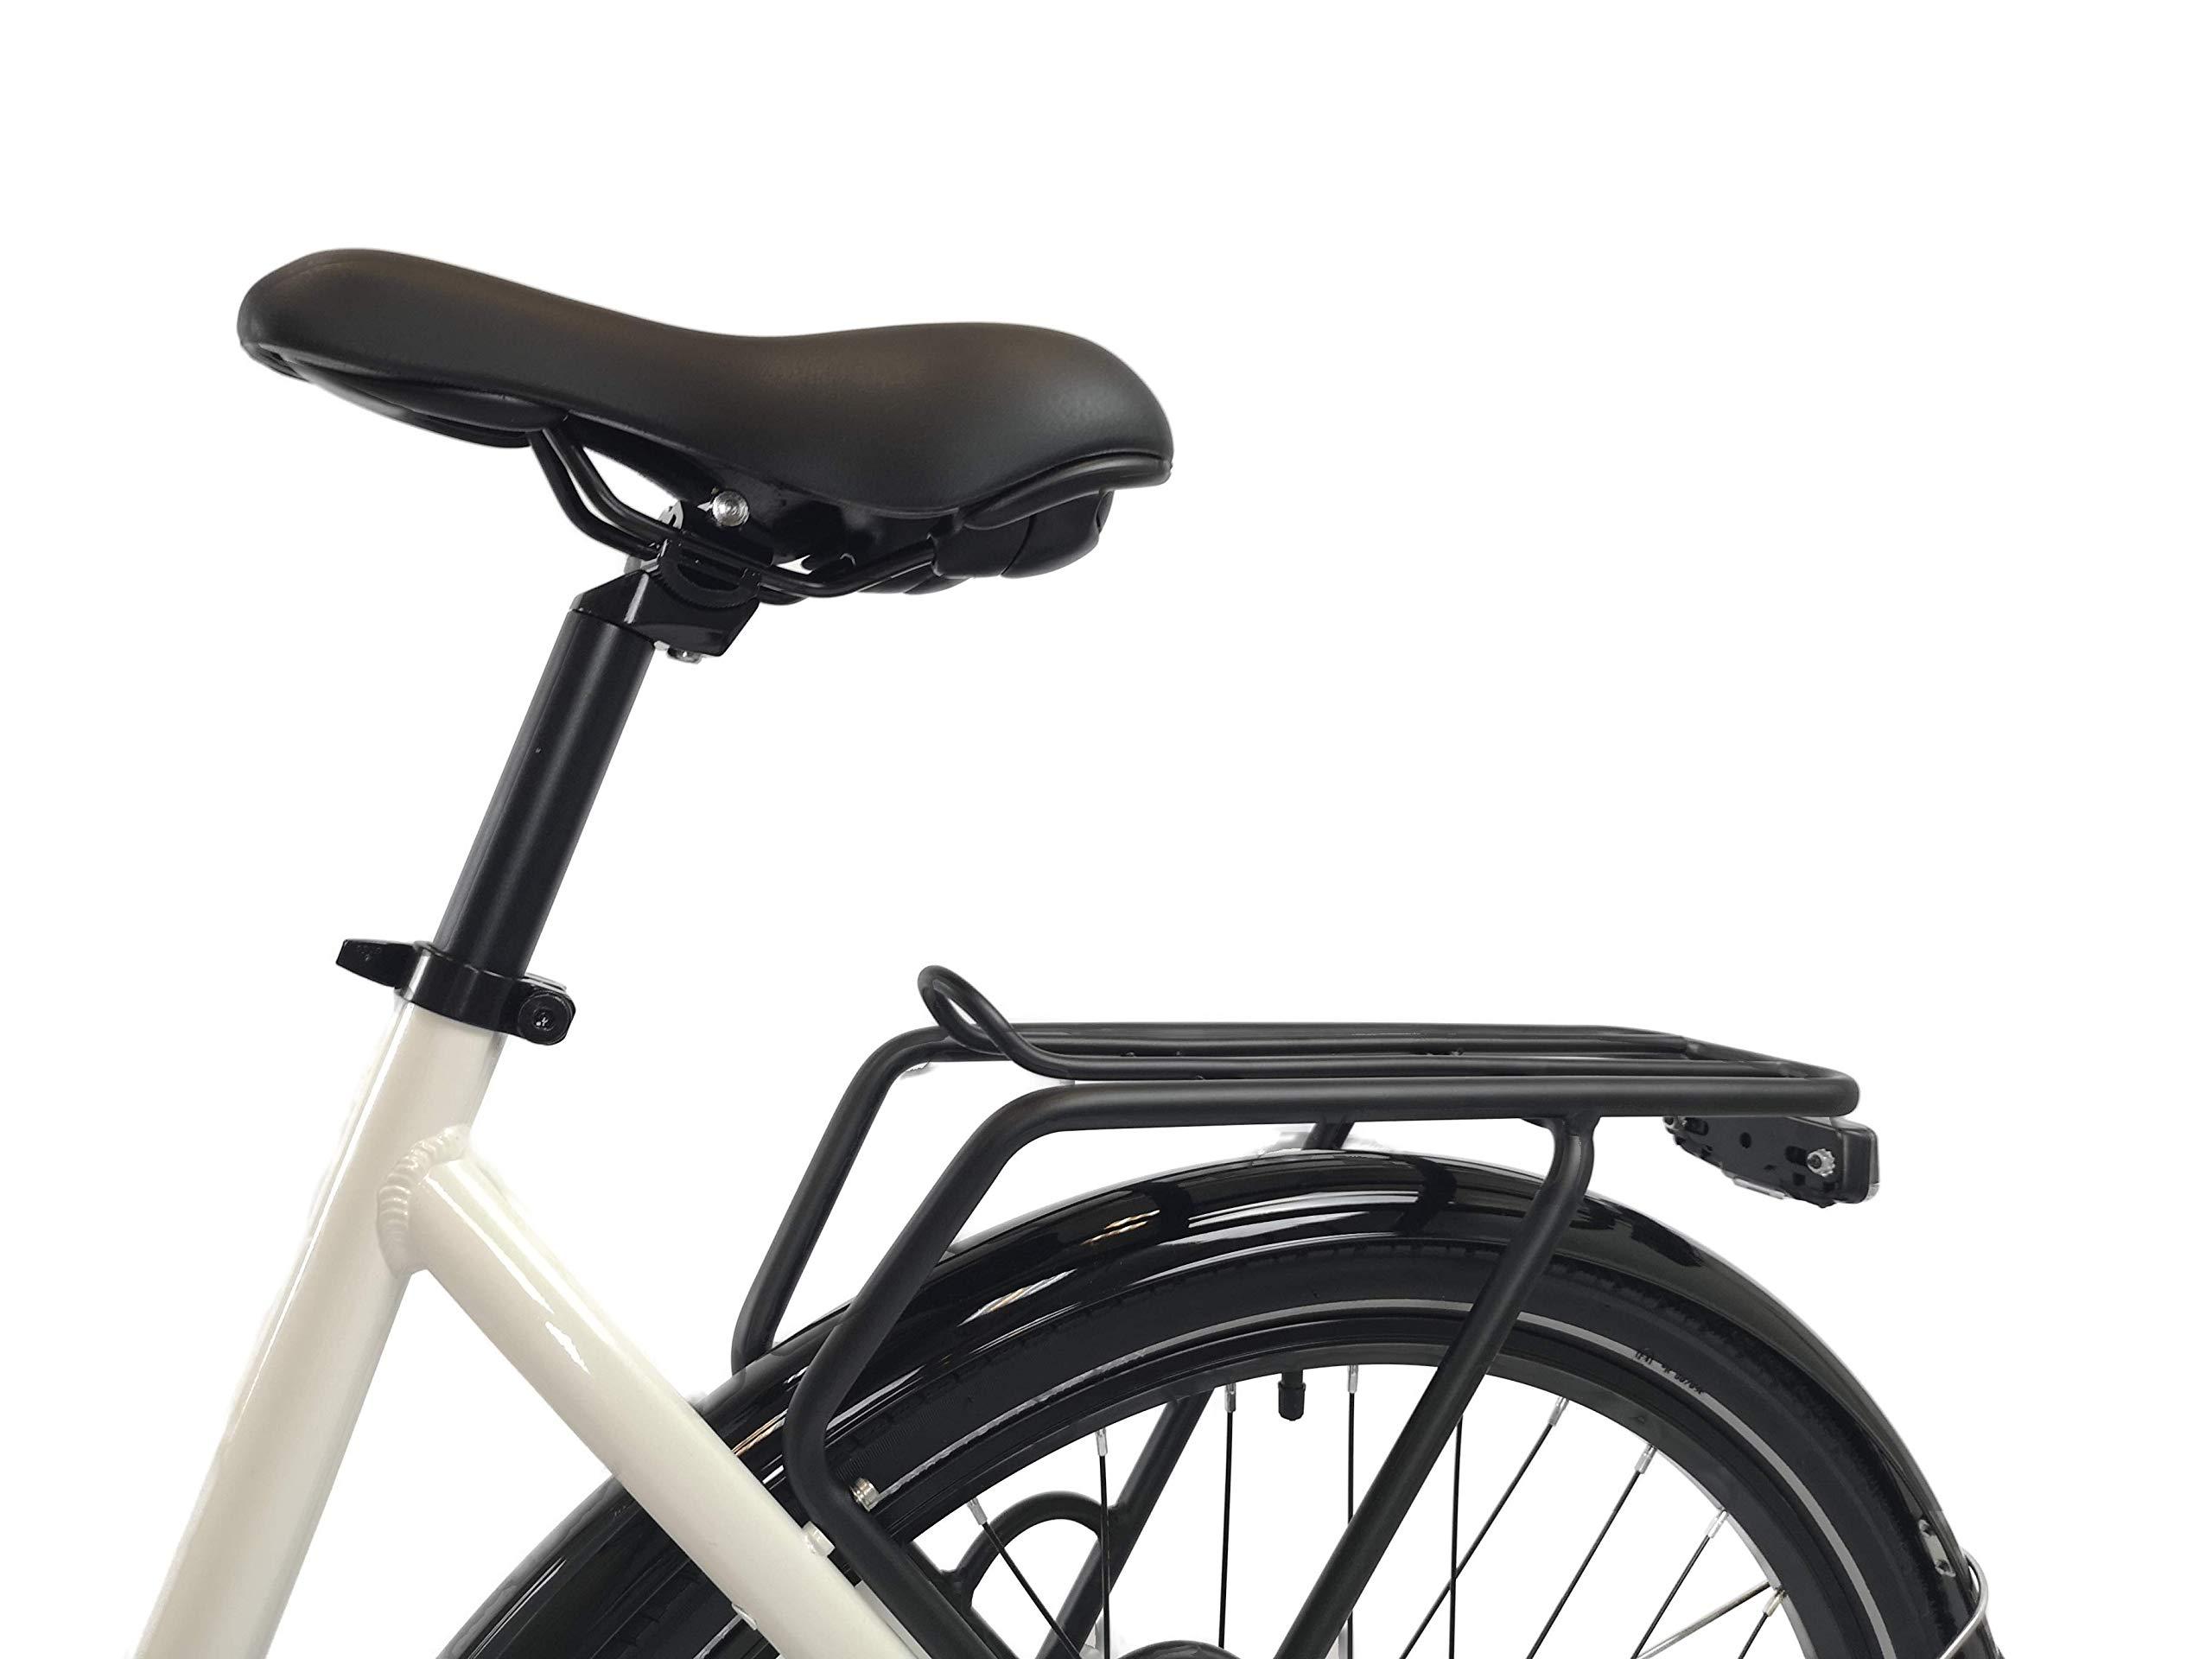 URBANBIKER Bicicleta Eléctrica Sidney, 250 W, 36V 14Ah (504Wh), 26